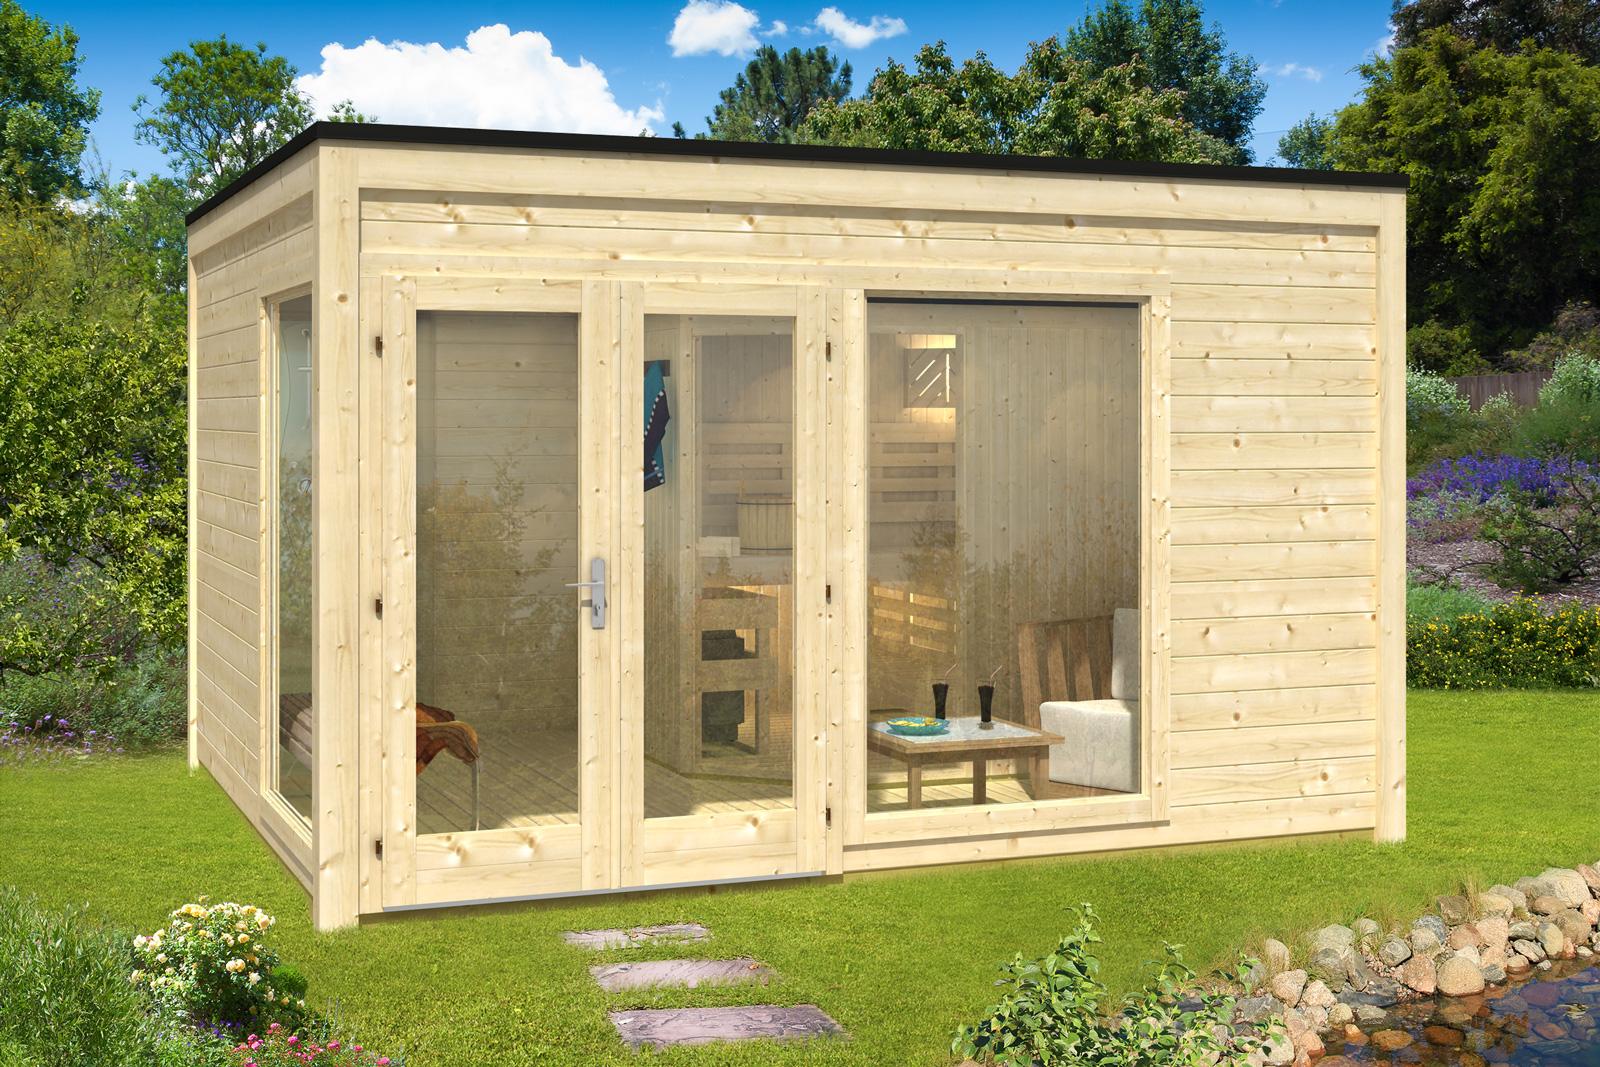 design saunahaus cubus 4035 a z gartenhaus gmbh. Black Bedroom Furniture Sets. Home Design Ideas